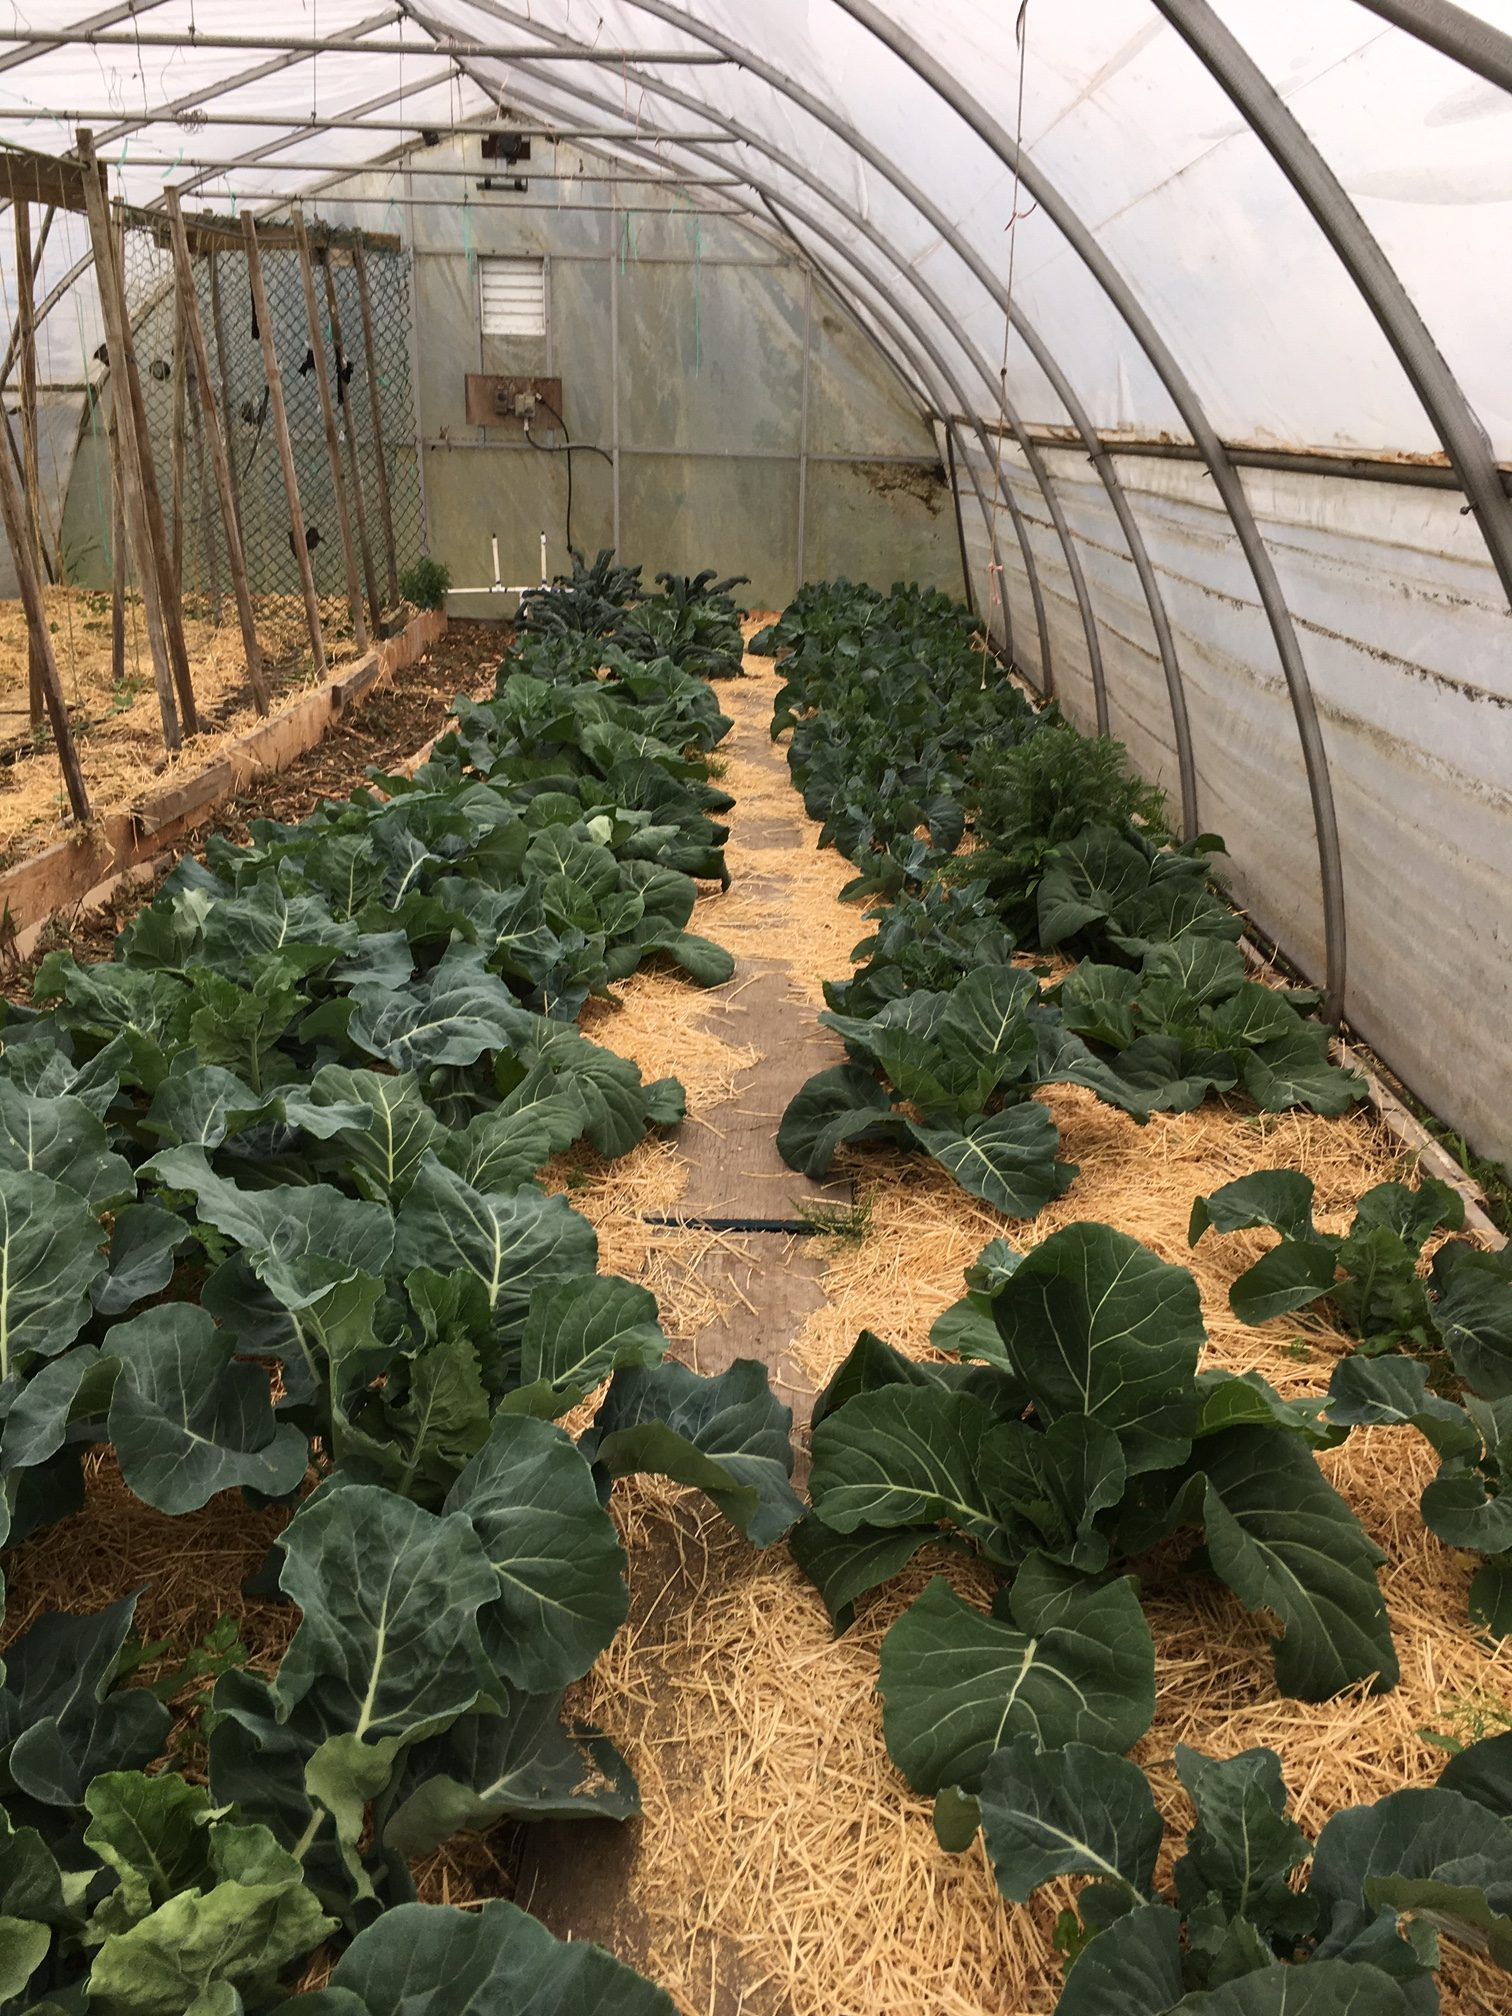 Thrangu Monastery orchard greenhouse farm worker richmond